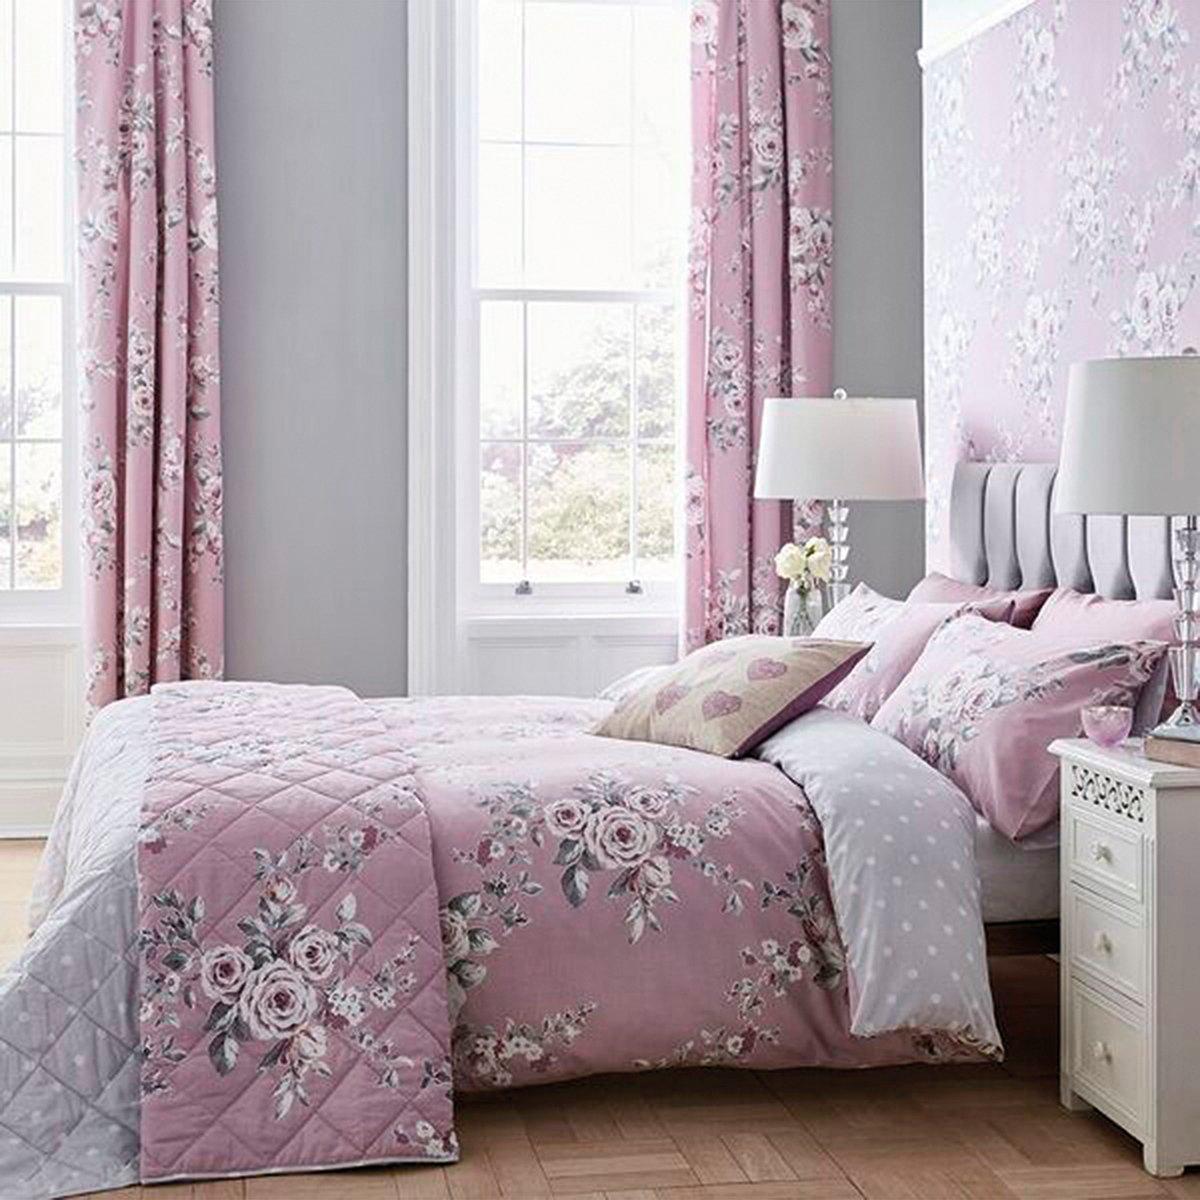 Canterbury Floral and Polka Dot Lined Eyelet Curtains